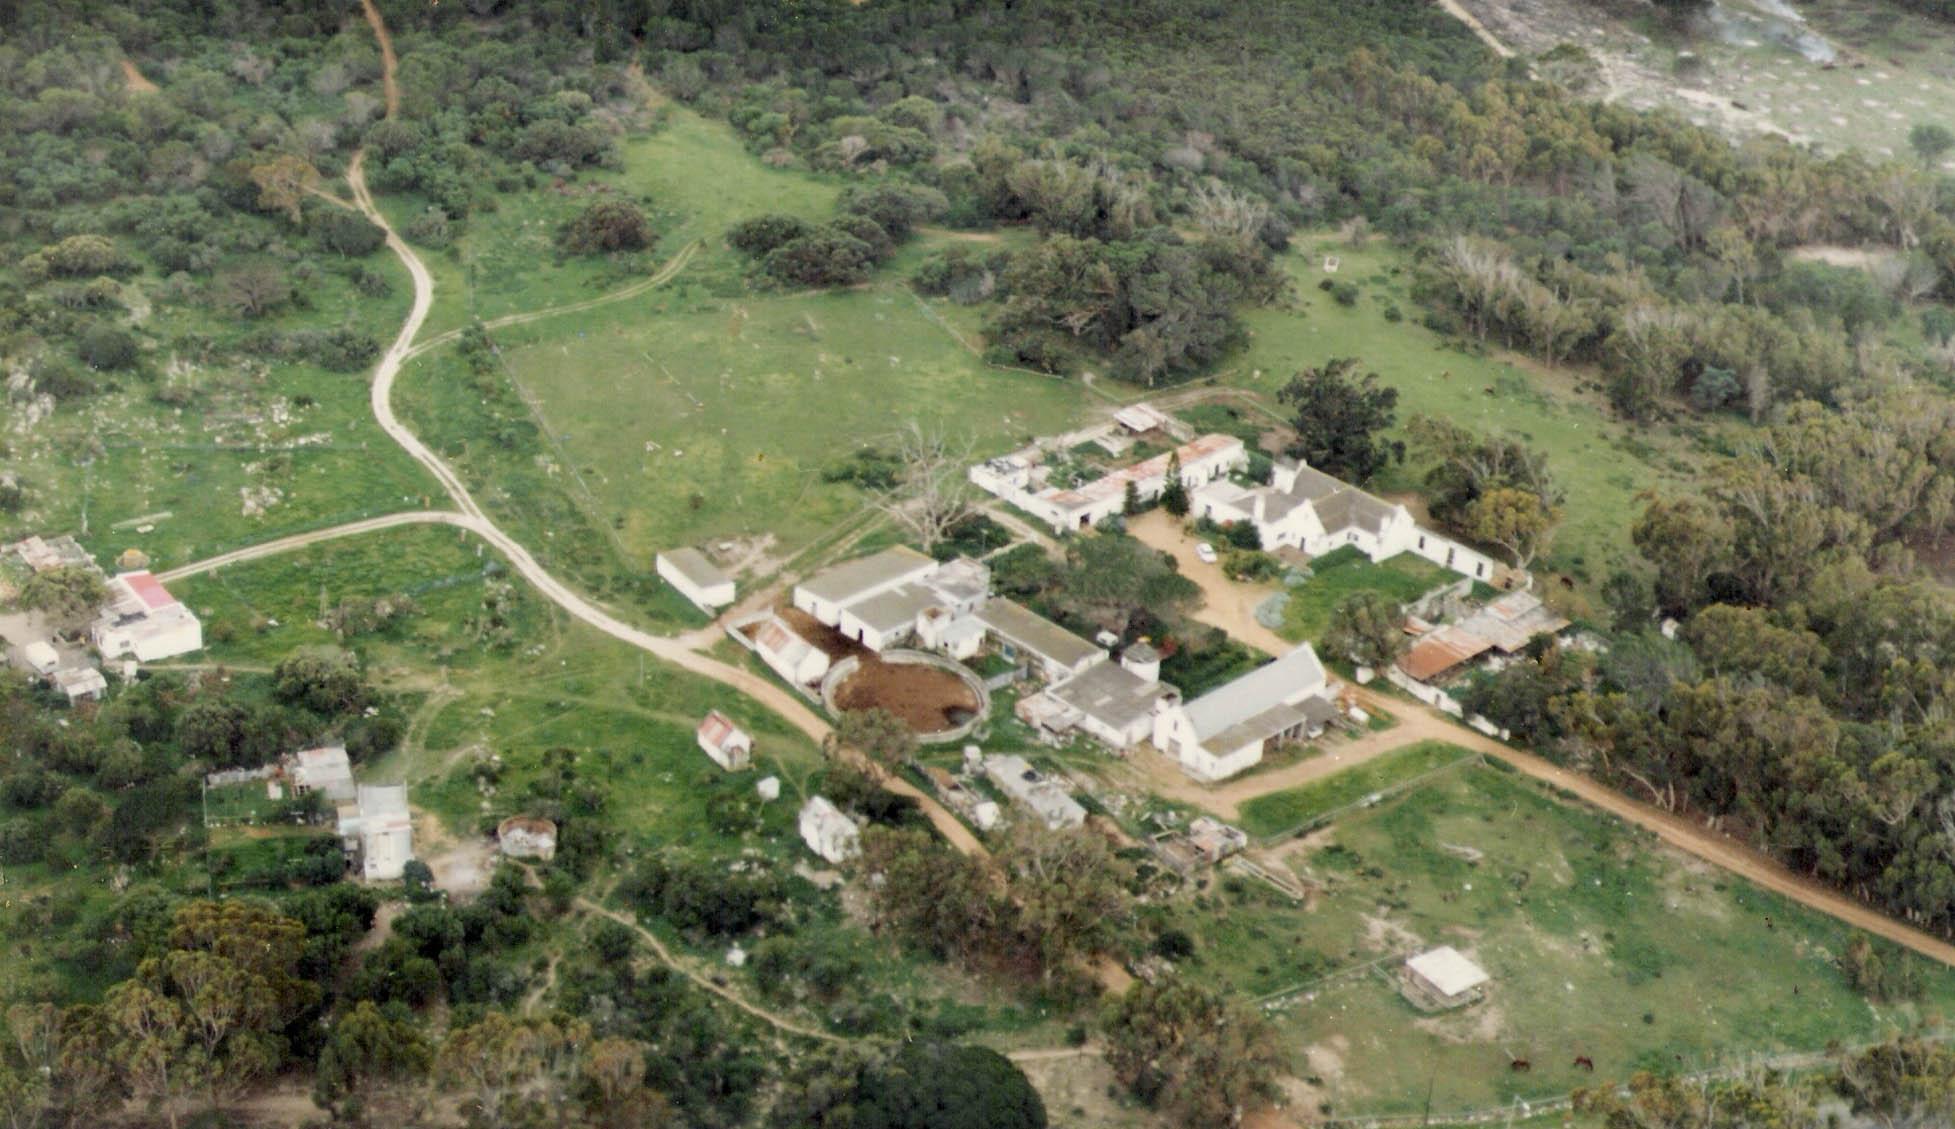 Aerial photo of Imhoff Farm